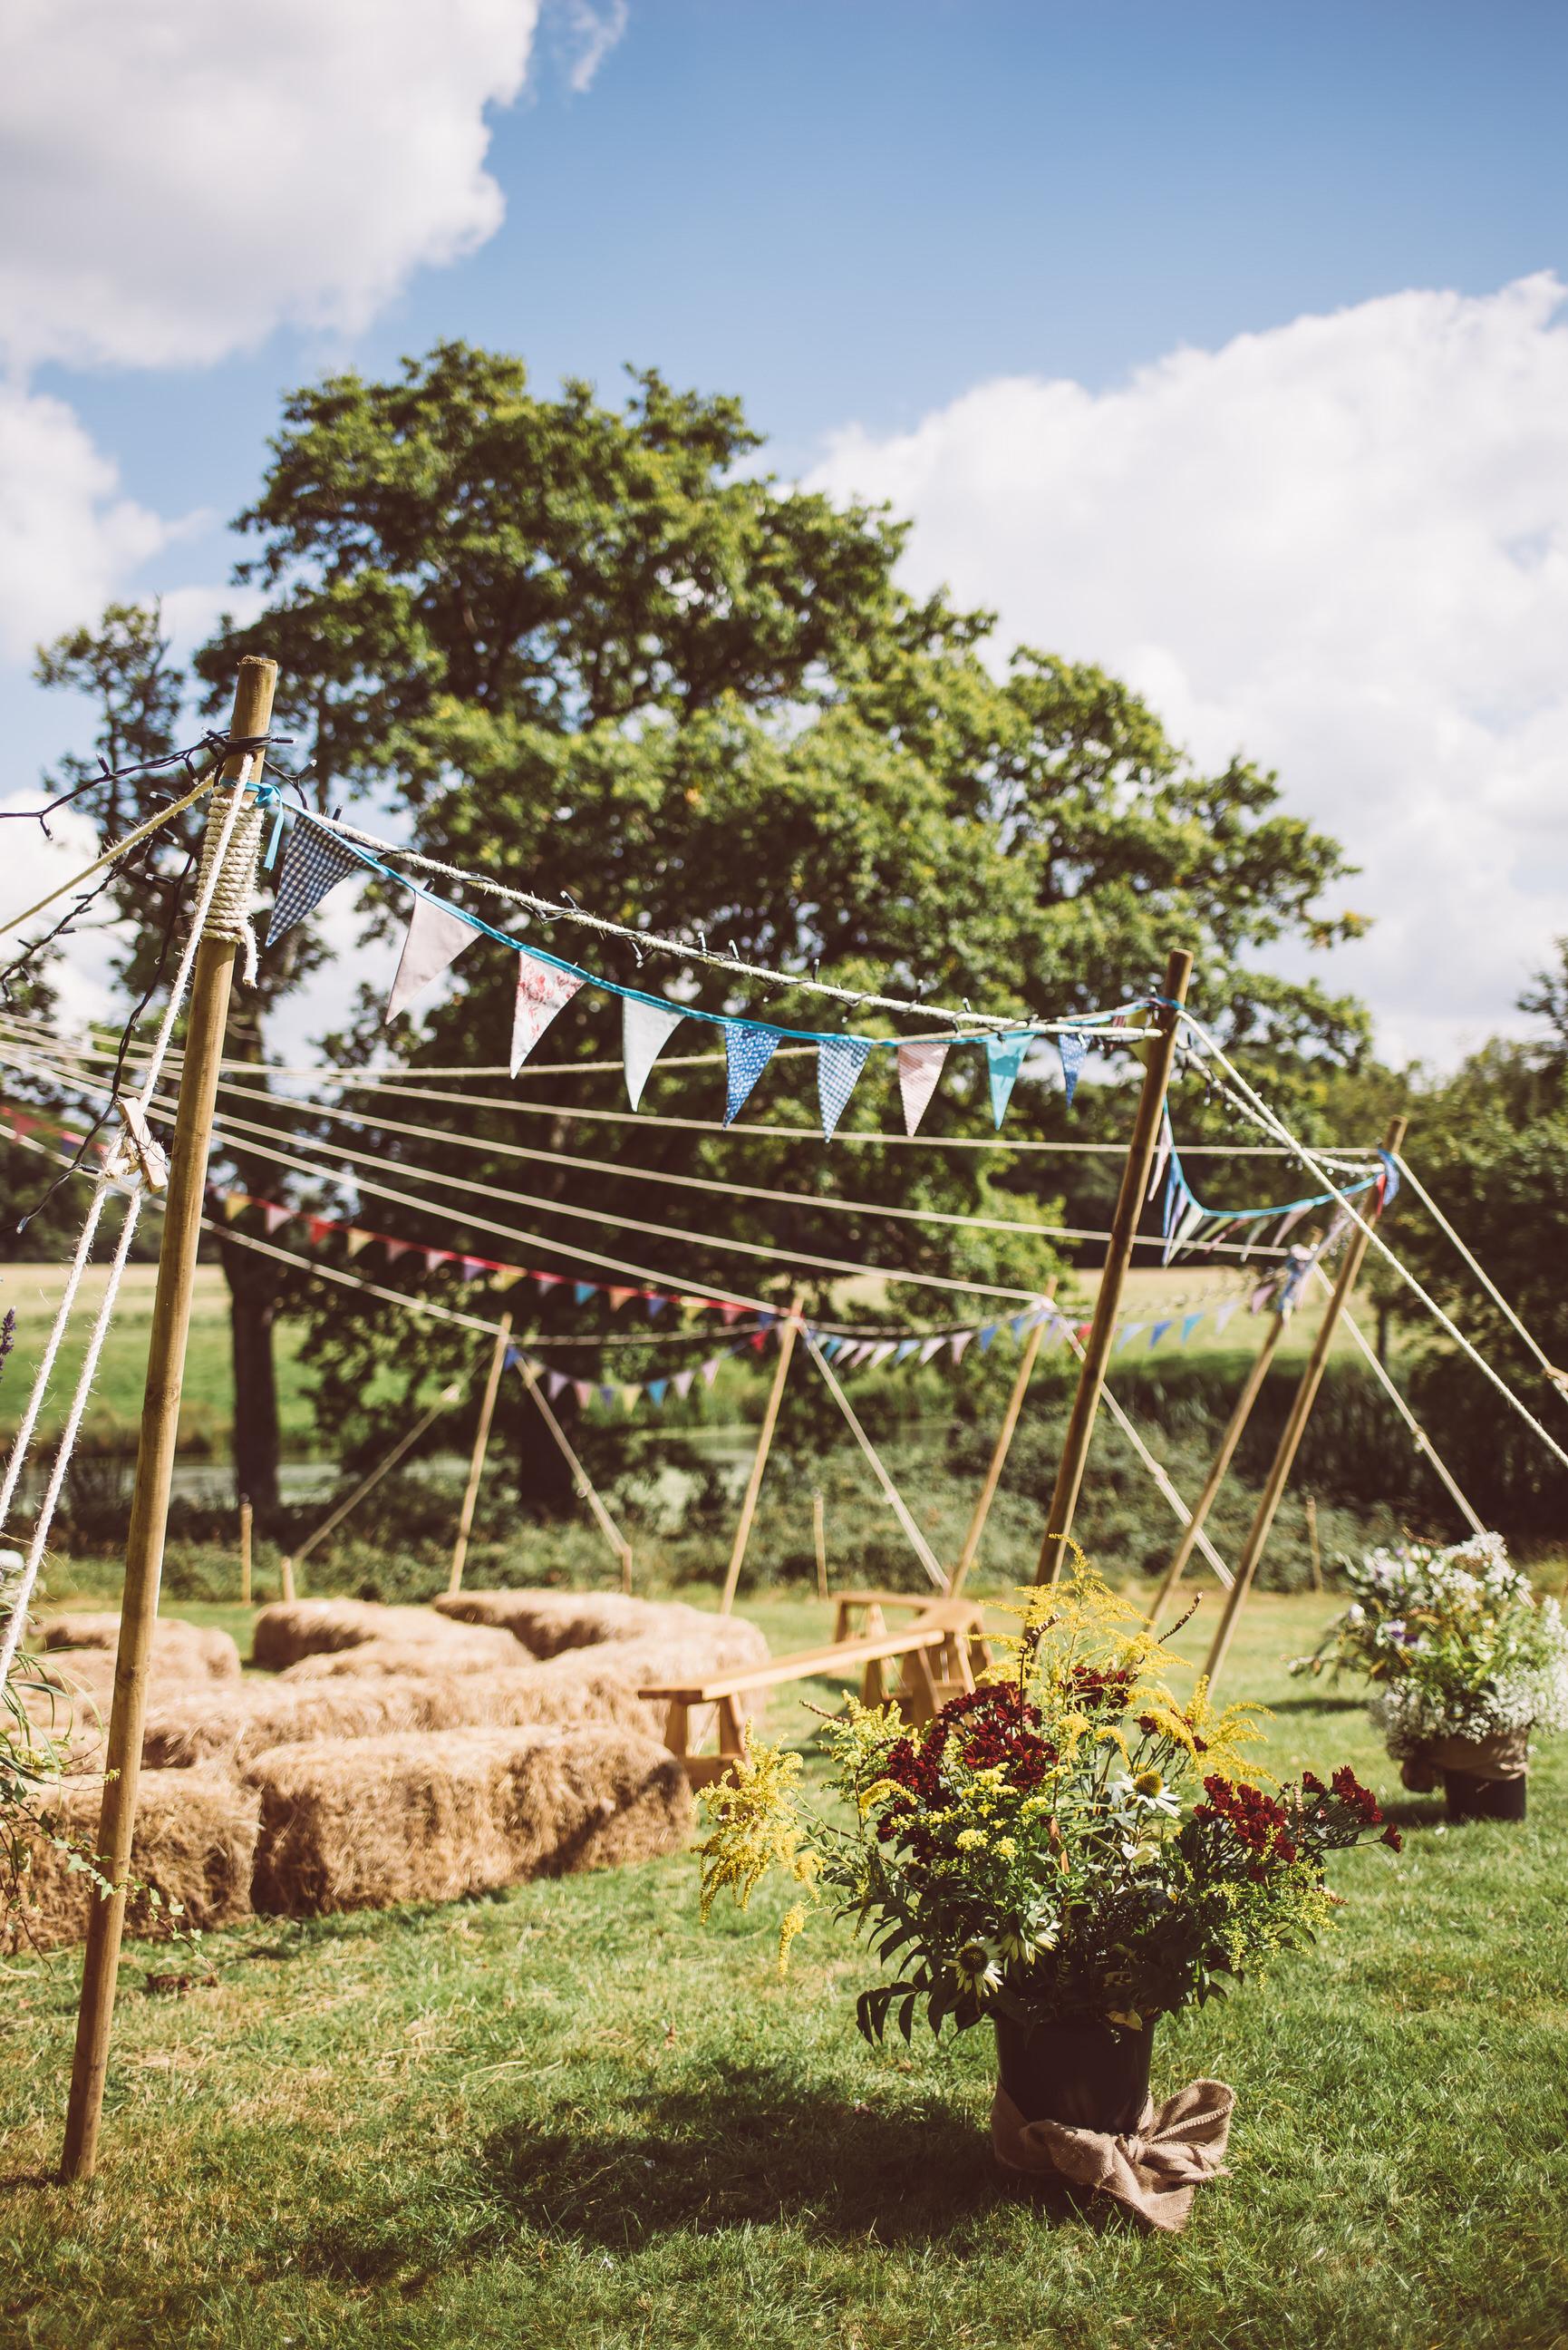 knepp-castle-boho-outdoor-wedding-9.jpg